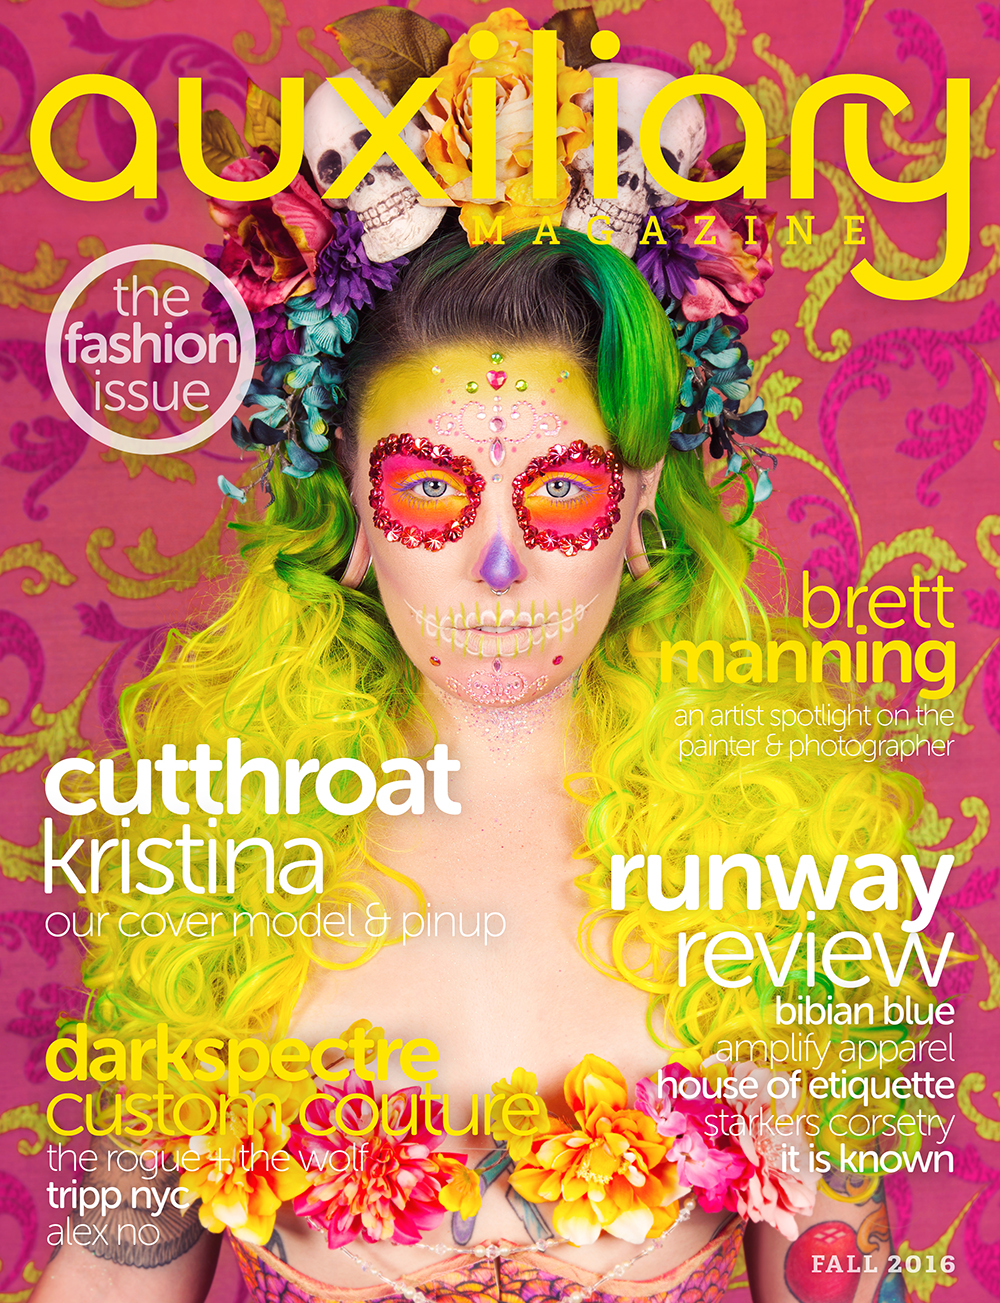 Fall 2016 Issue featuring Cutthroat Kristina